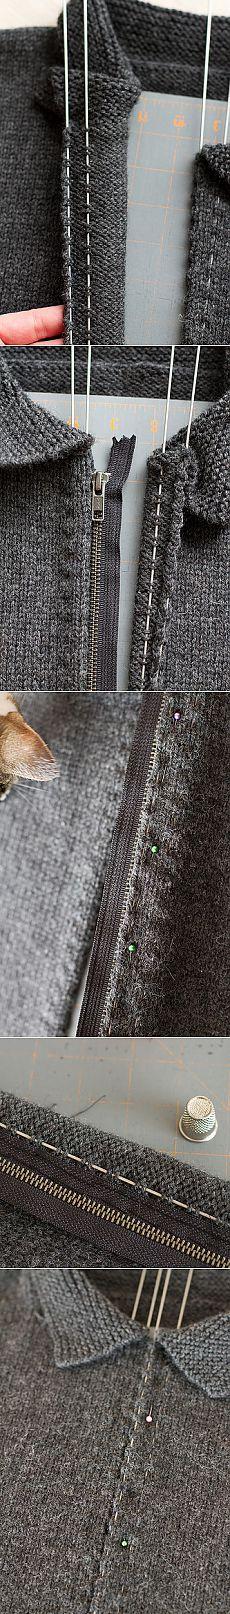 Splityarn »Blog Archive» simple knitted sweater zipper install ever